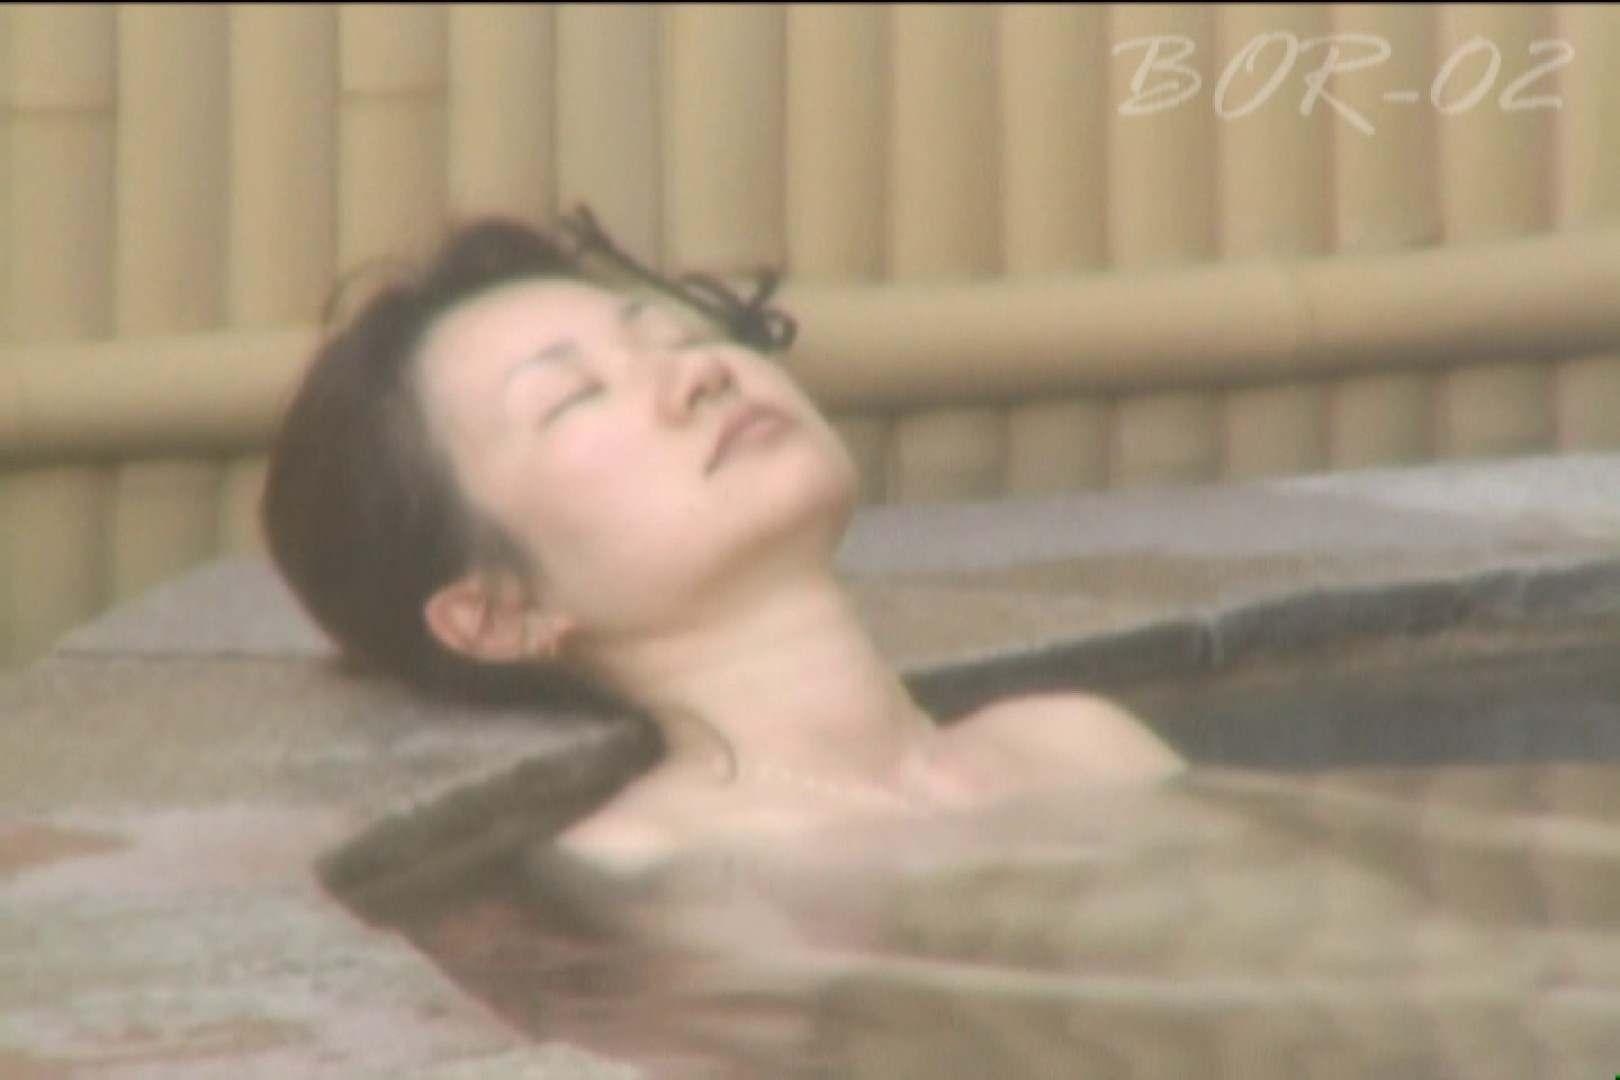 Aquaな露天風呂Vol.477 露天 アダルト動画キャプチャ 99PICs 62